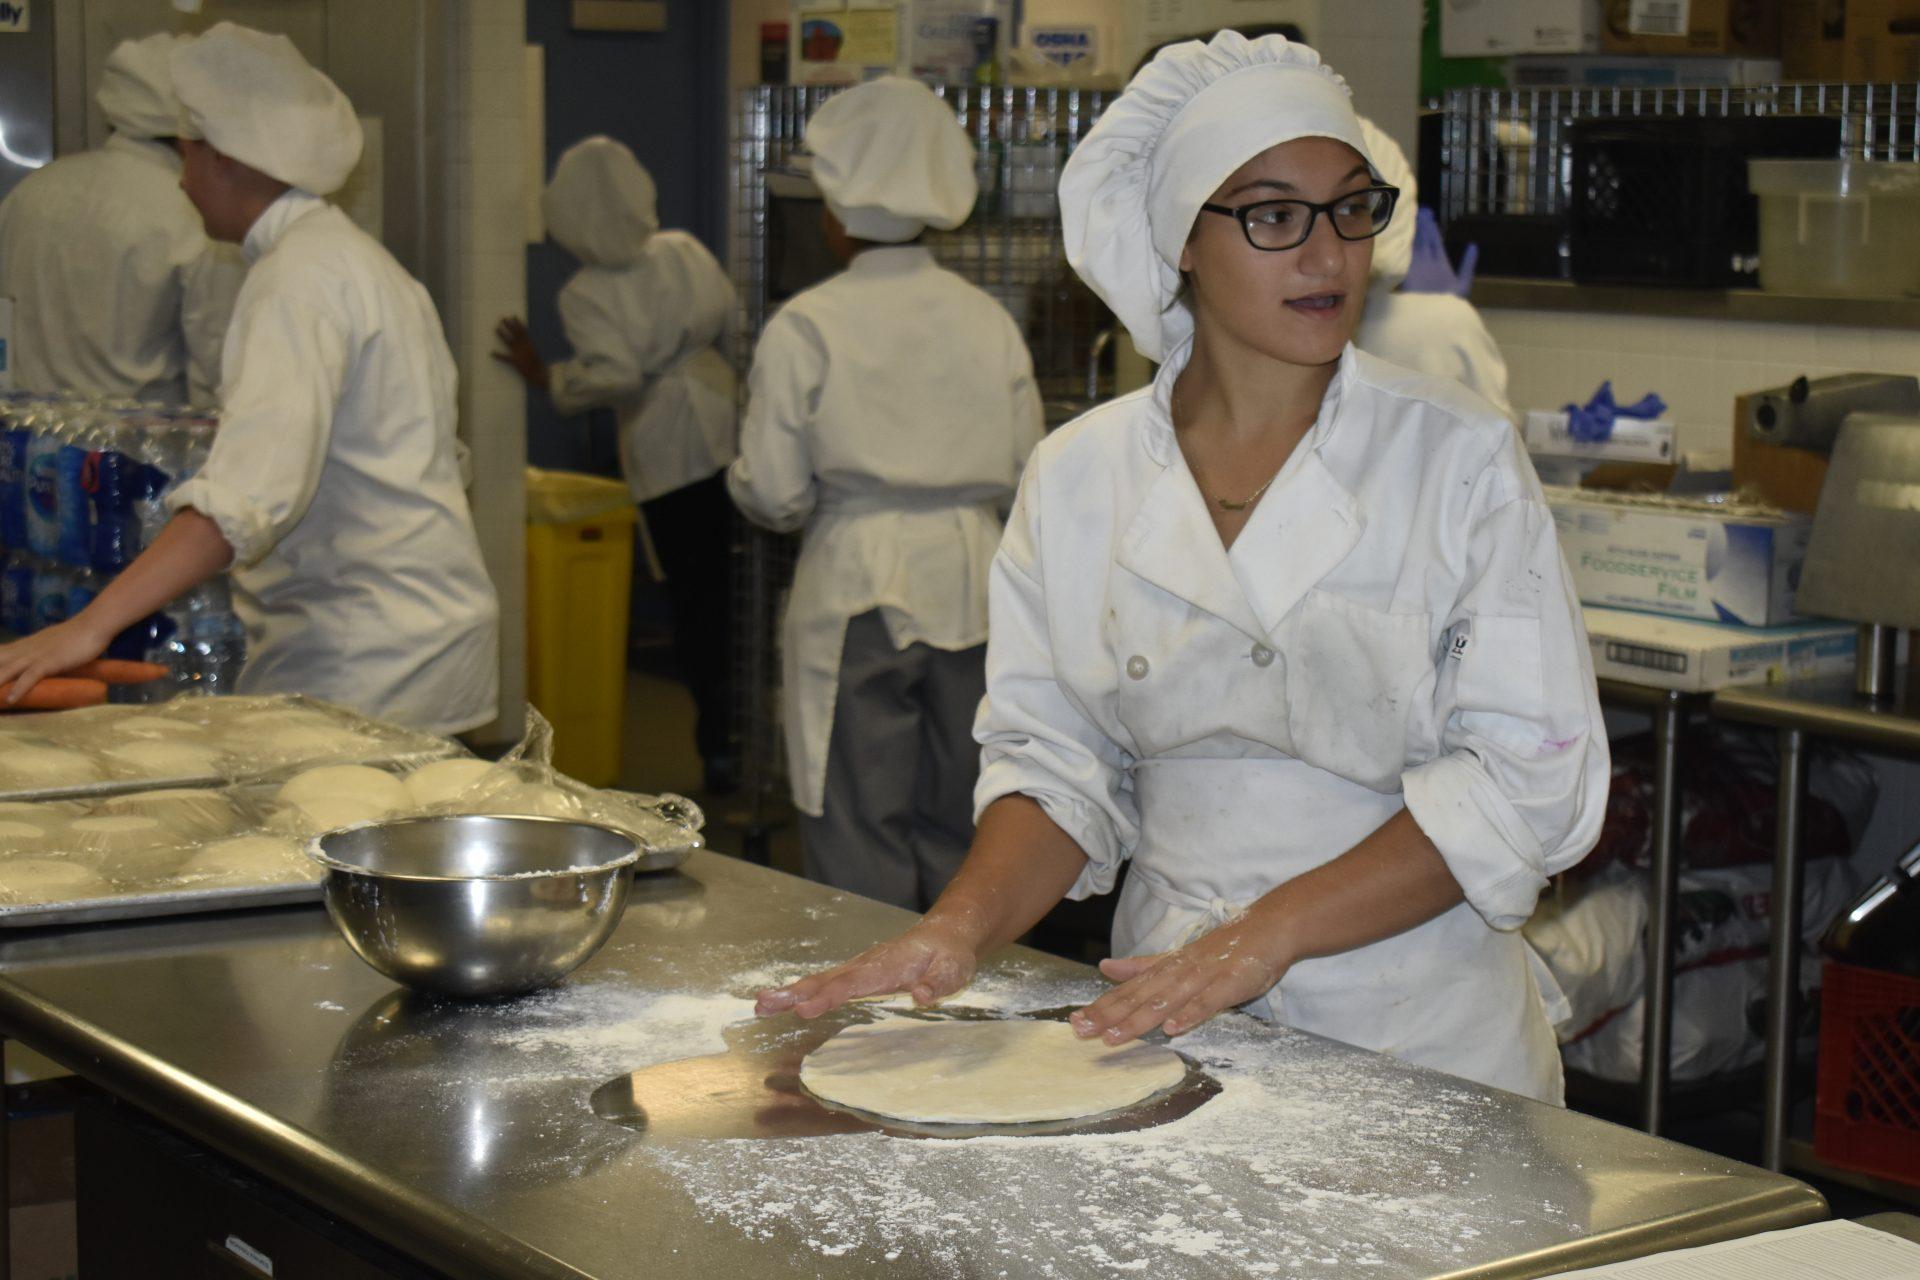 Cu student rolling dough